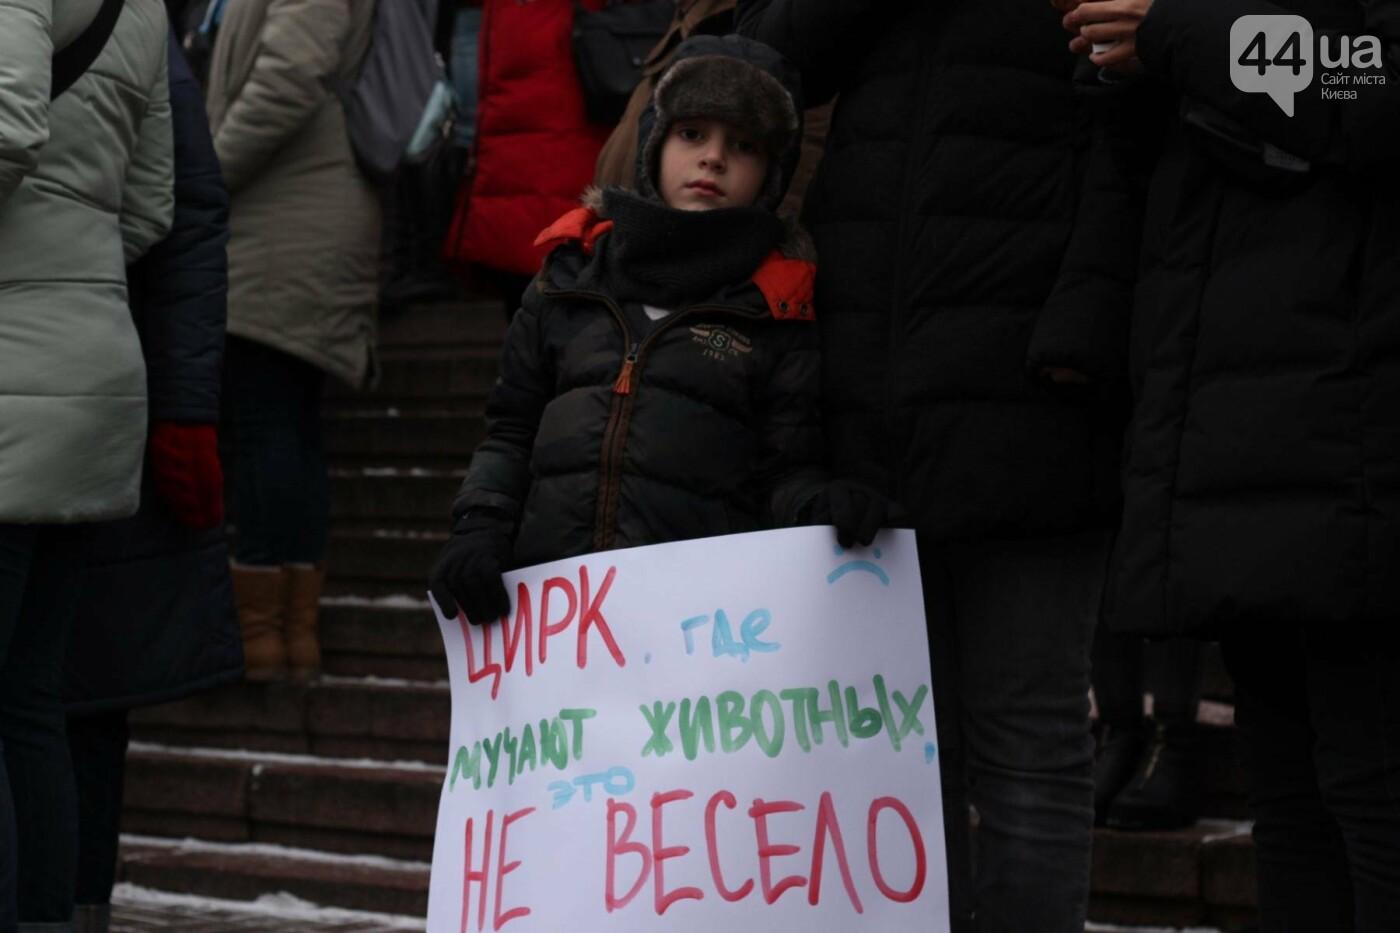 Цирк без животных: как в Киеве прошла акция протеста, фото-1